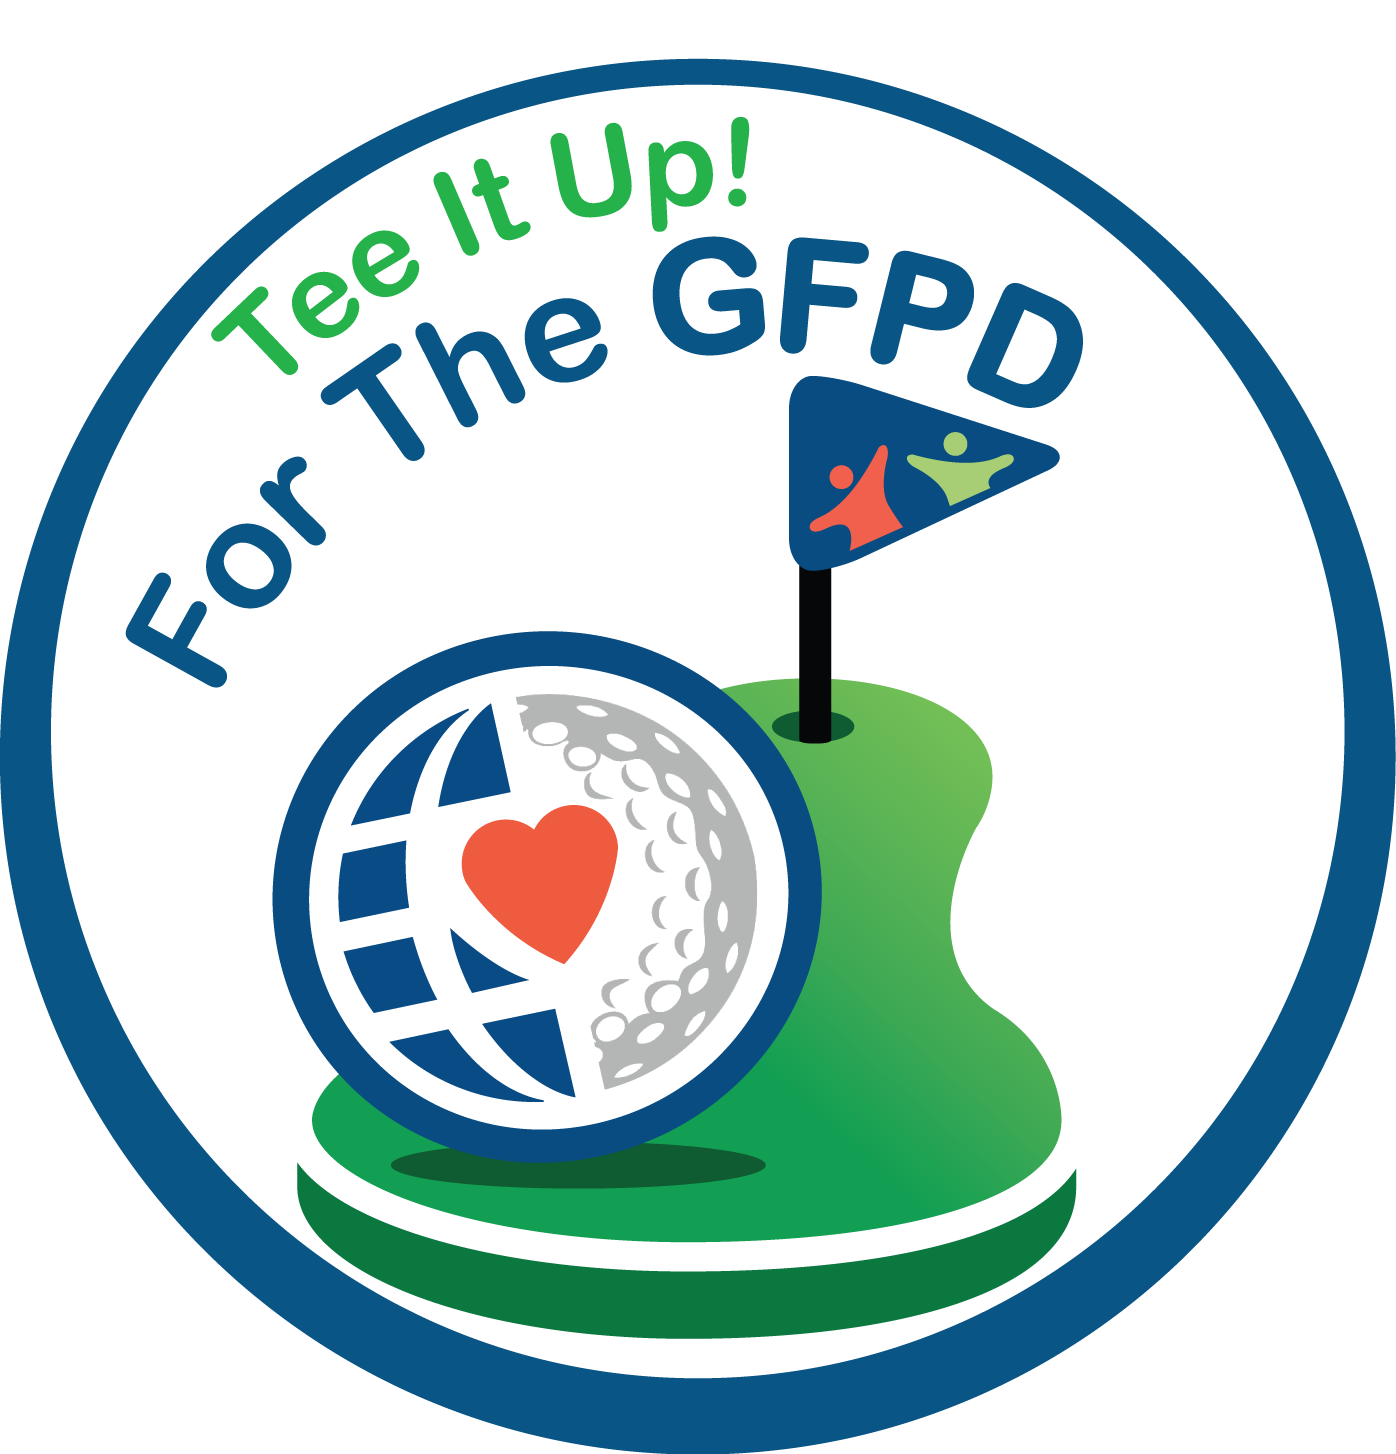 Final Logo - TeeItUp4GFPD (transparent).png